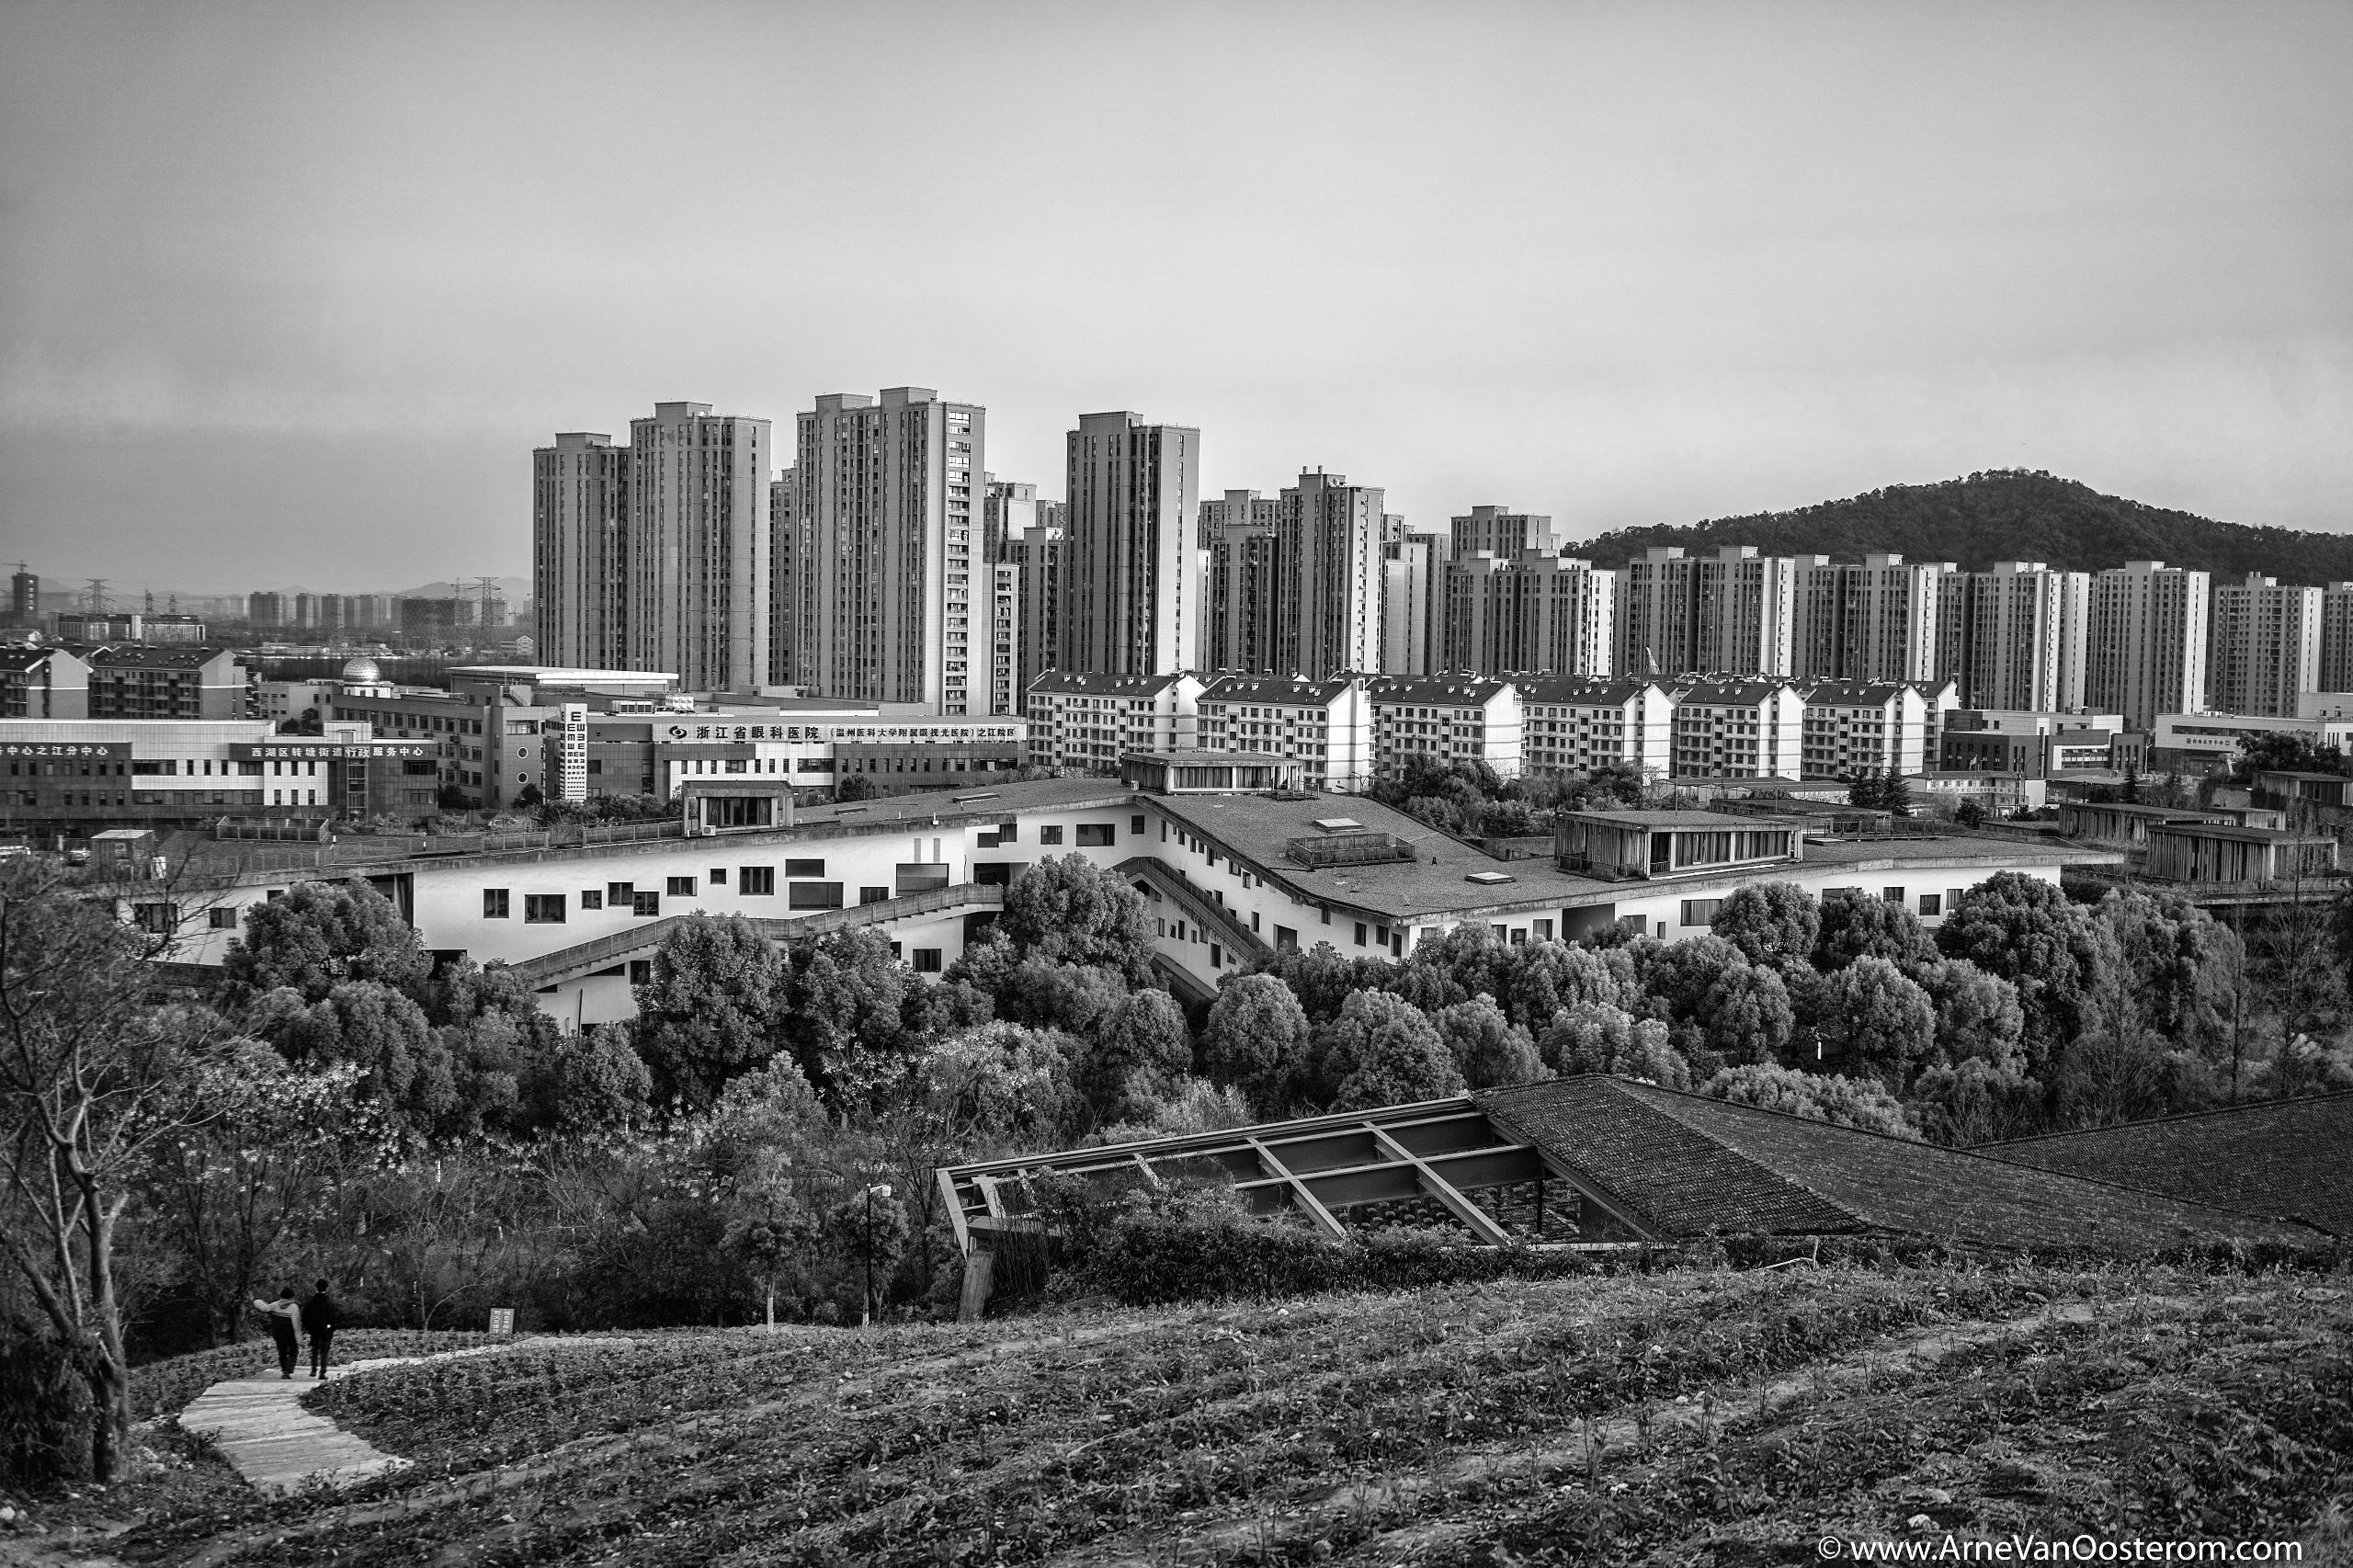 Hanghzou China - blackandwhitephotography - arnevanoosterom | ello